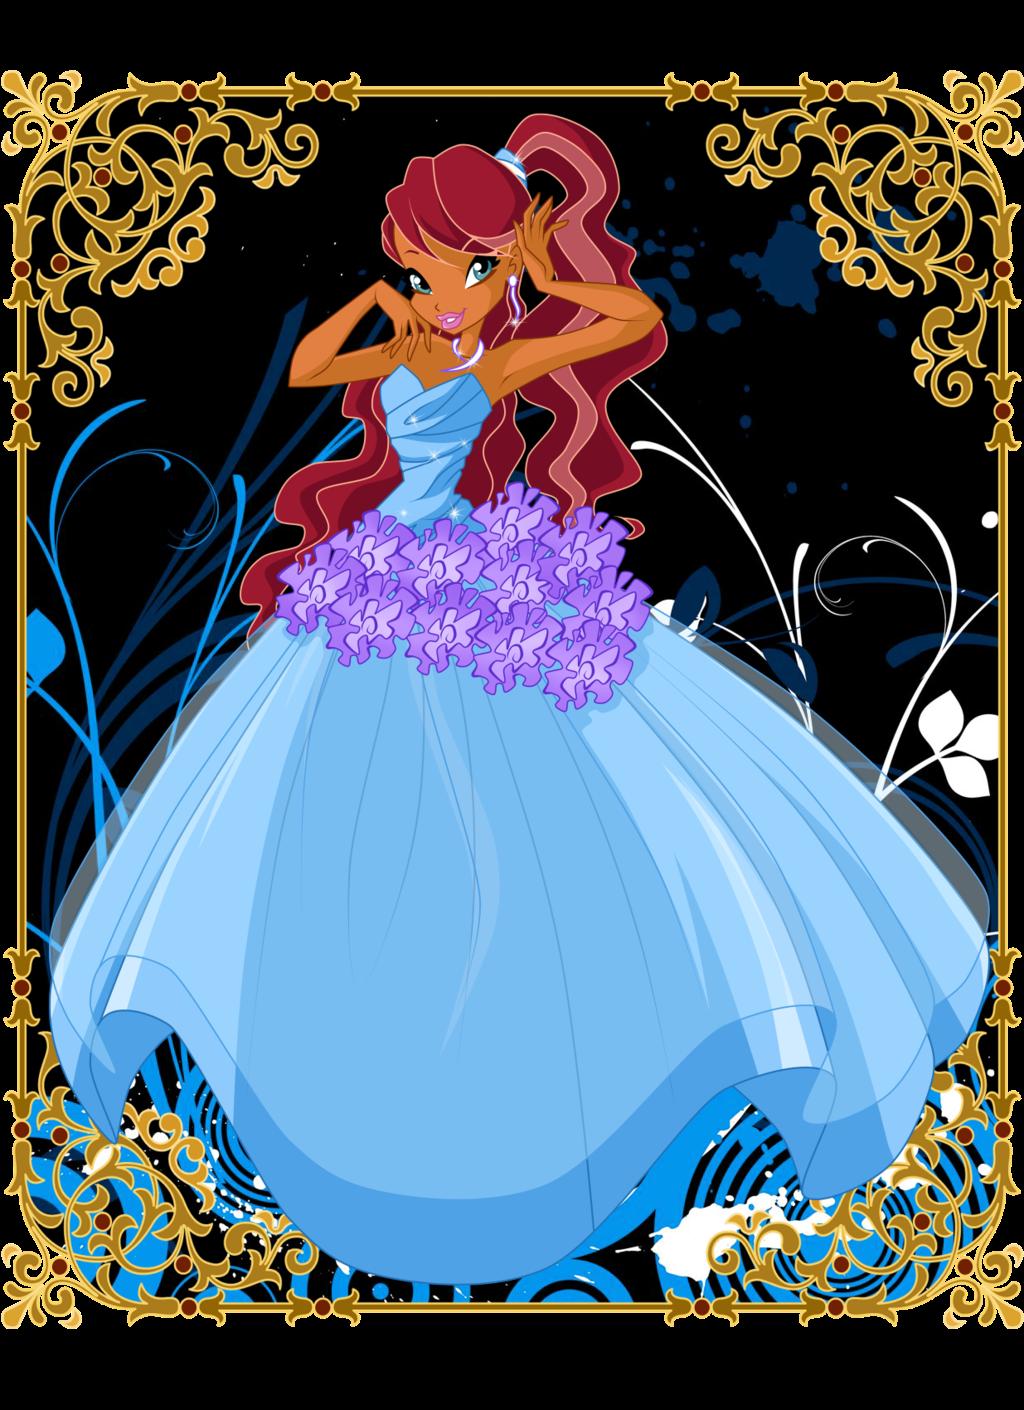 Just Winx Winx Club Flower Princesses